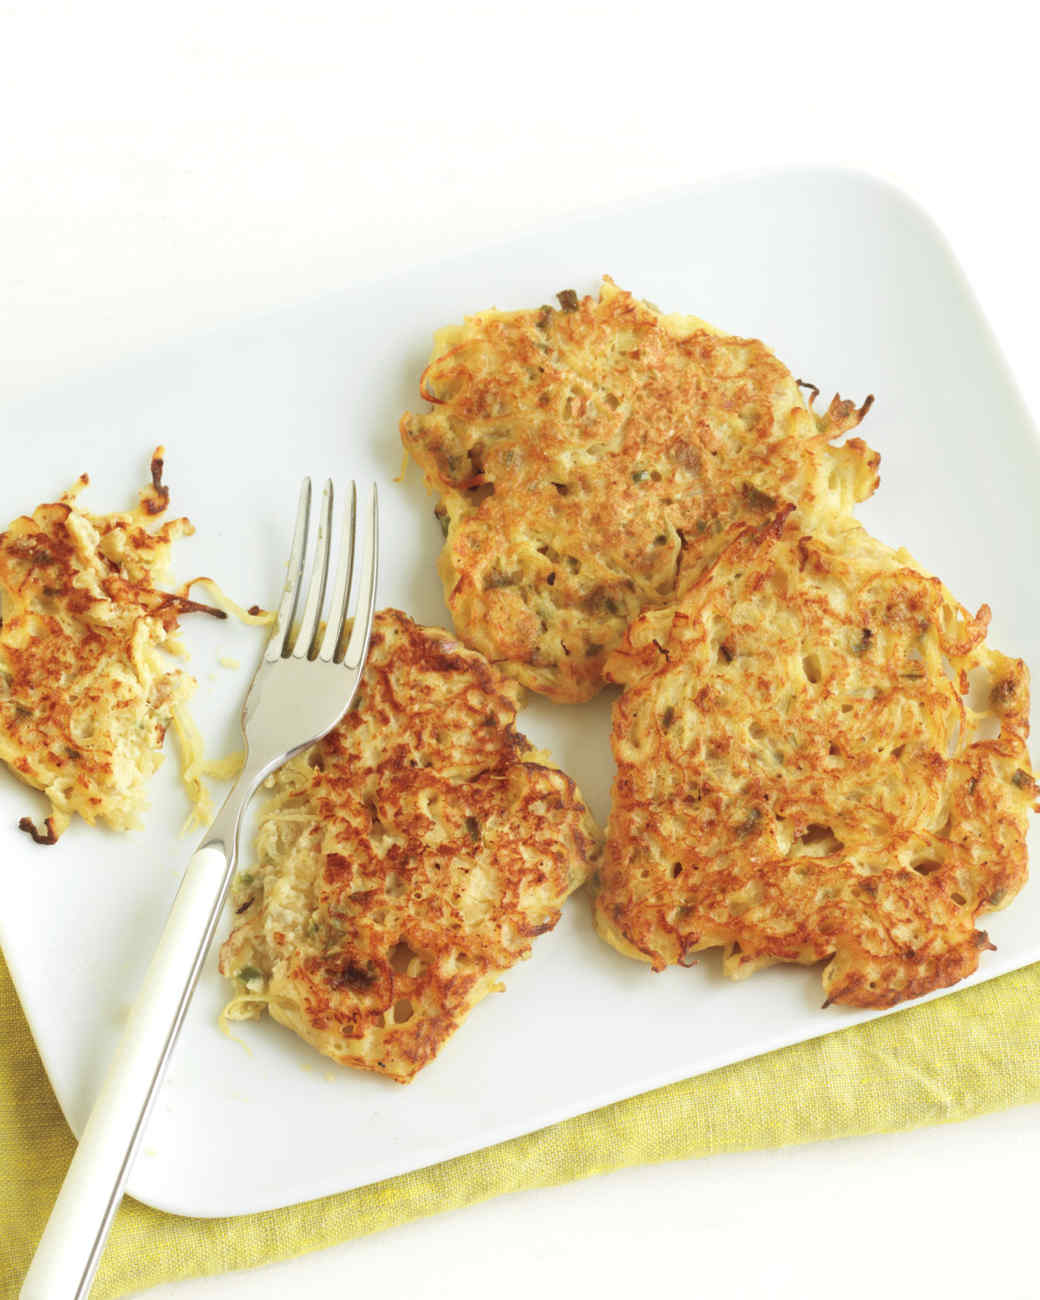 spiced-squash-pancakes-med107845.jpg